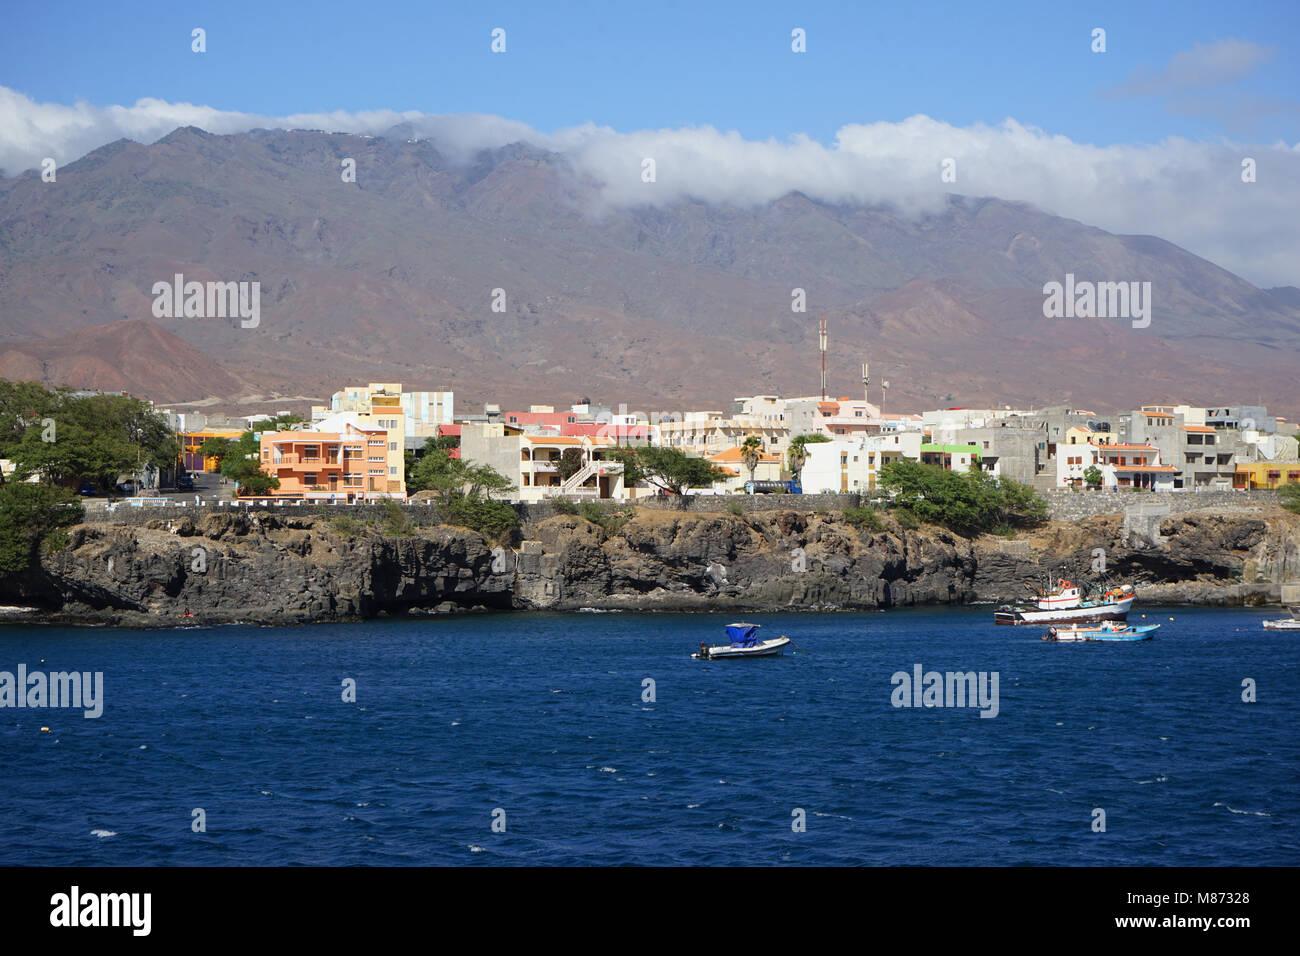 Porto Novo, Santo Antao Island, Cape Verde - Stock Image